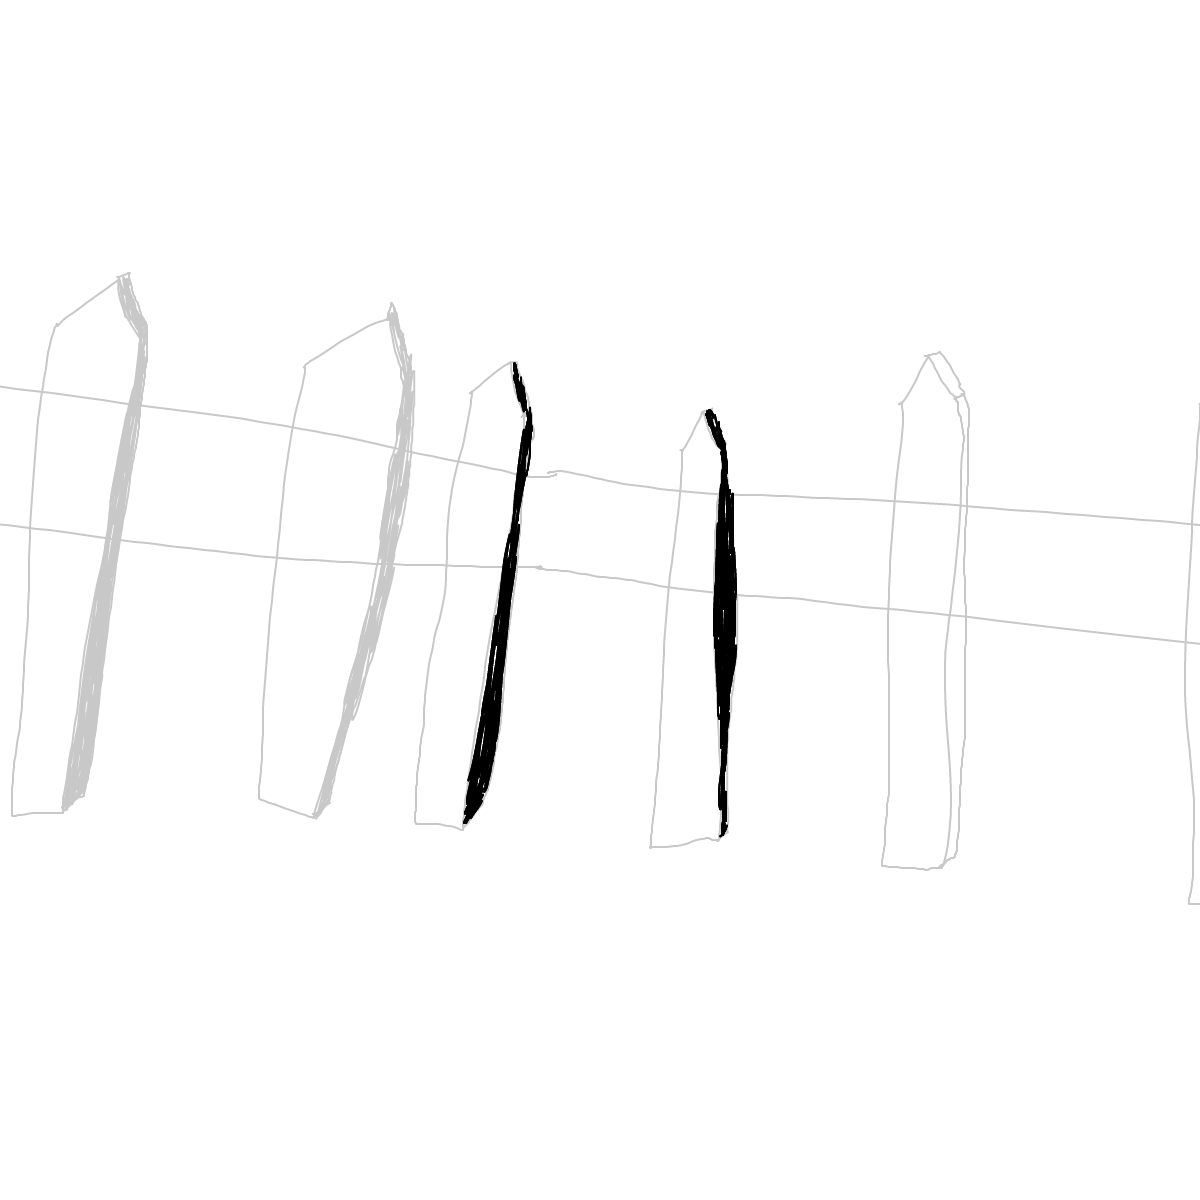 BAAAM drawing#9375 lat:52.4750518798828100lng: 13.4071493148803710